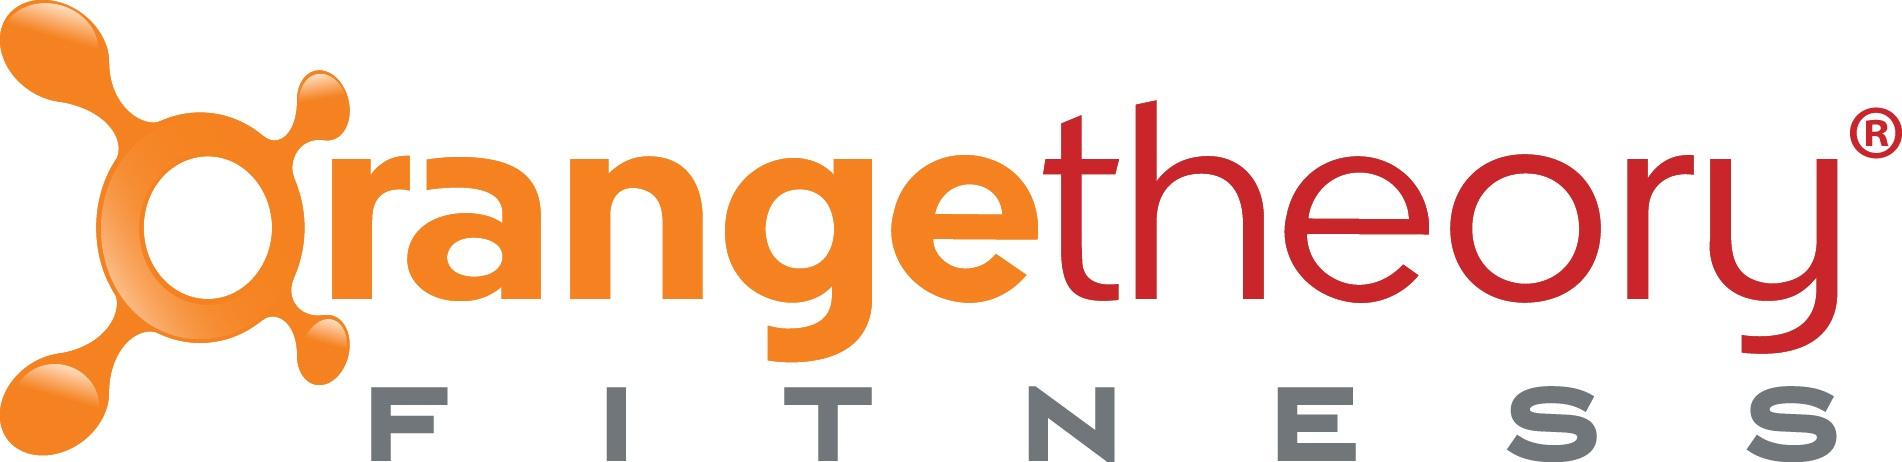 Orangetheory Fitness - Logo.jpg